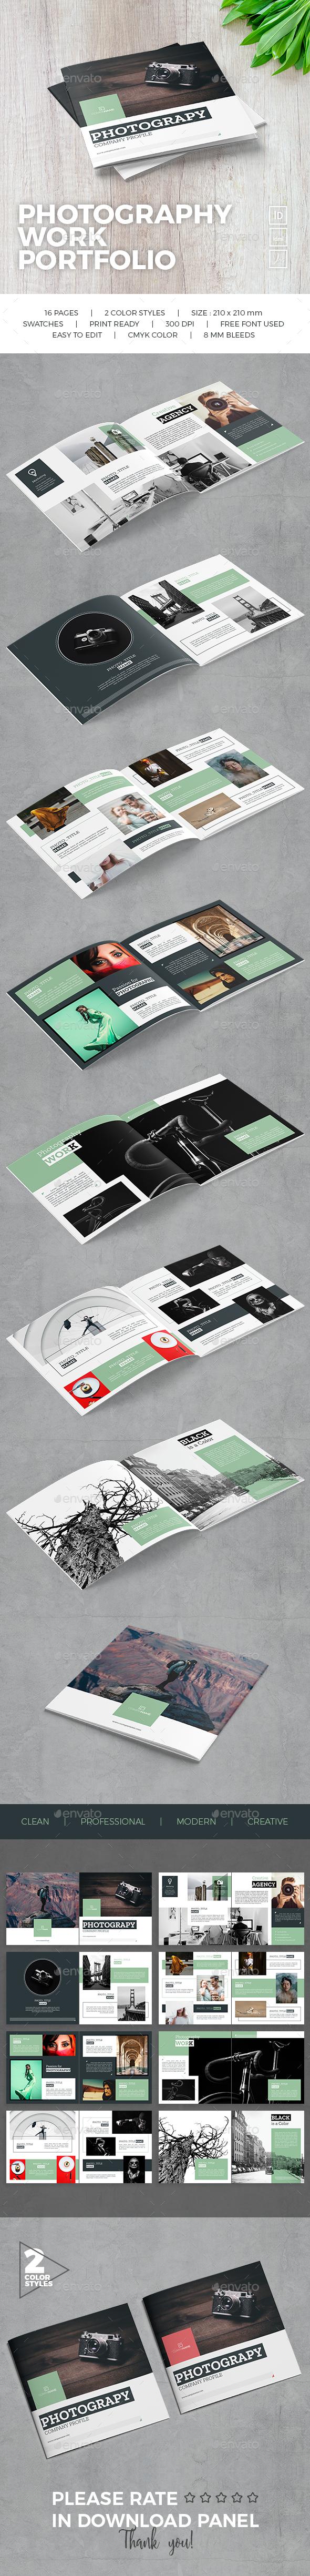 Photography Work Portfolio - Portfolio Brochures